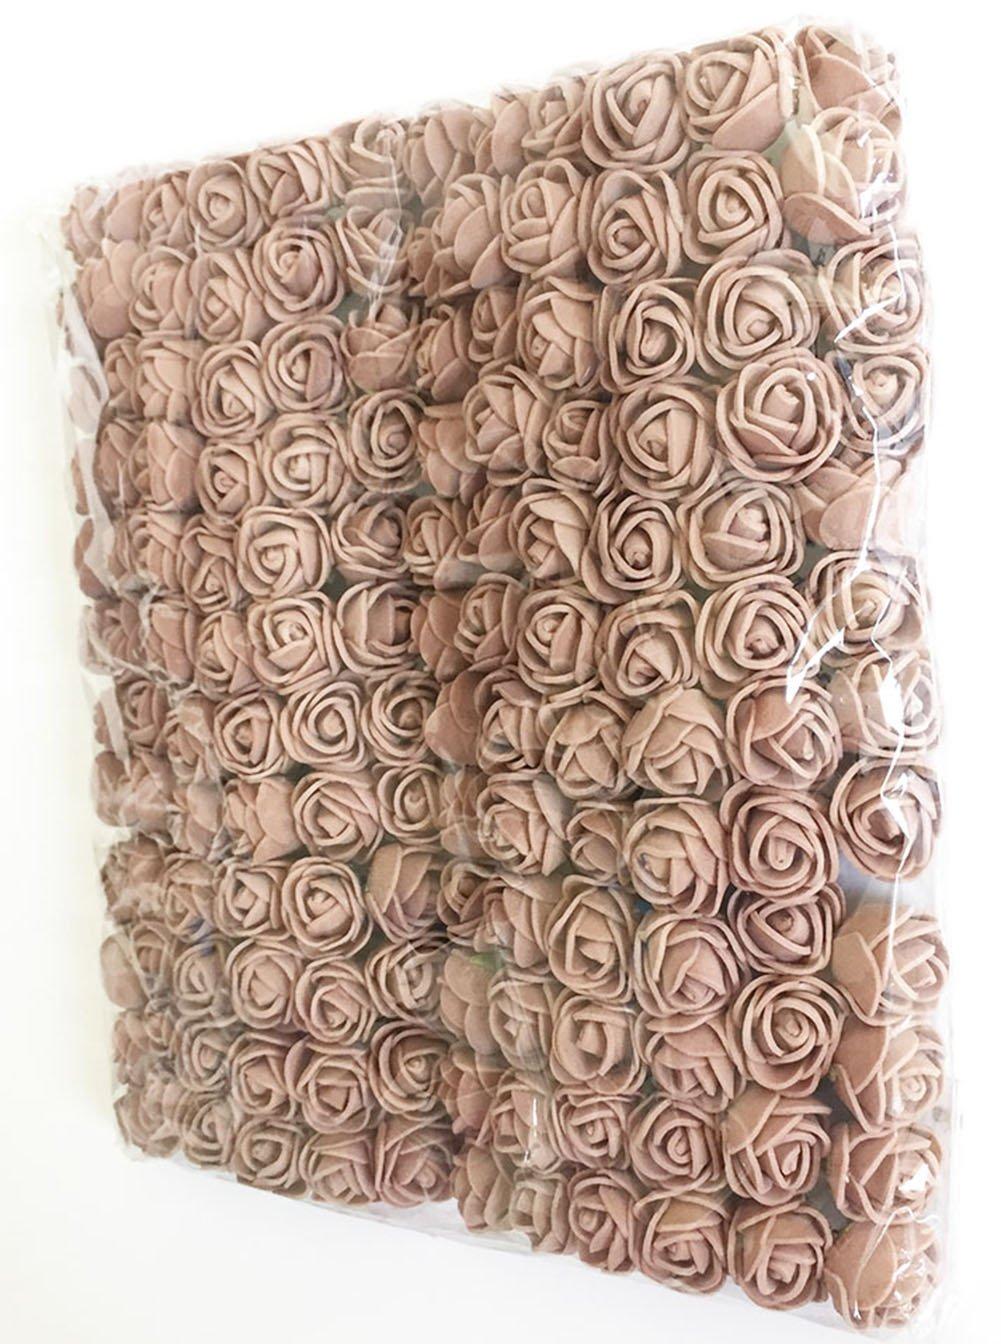 Fake-Rose-Flower-Heads-Artfen-144pcs-Mini-Artificial-Roses-DIY-Wedding-Flowers-Accessories-Make-Bridal-Hair-Clips-Headbands-Dress-Approx-1-Inch-Diameter